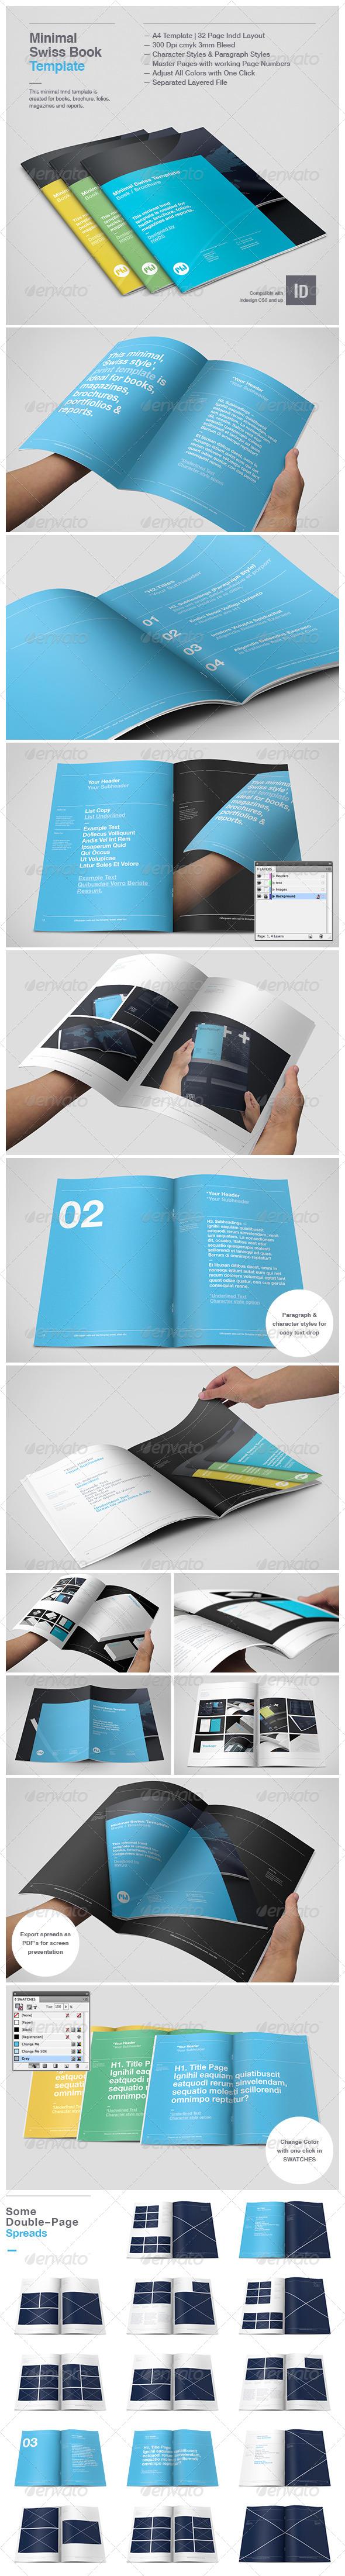 Minimal Swiss Print Template - Informational Brochures